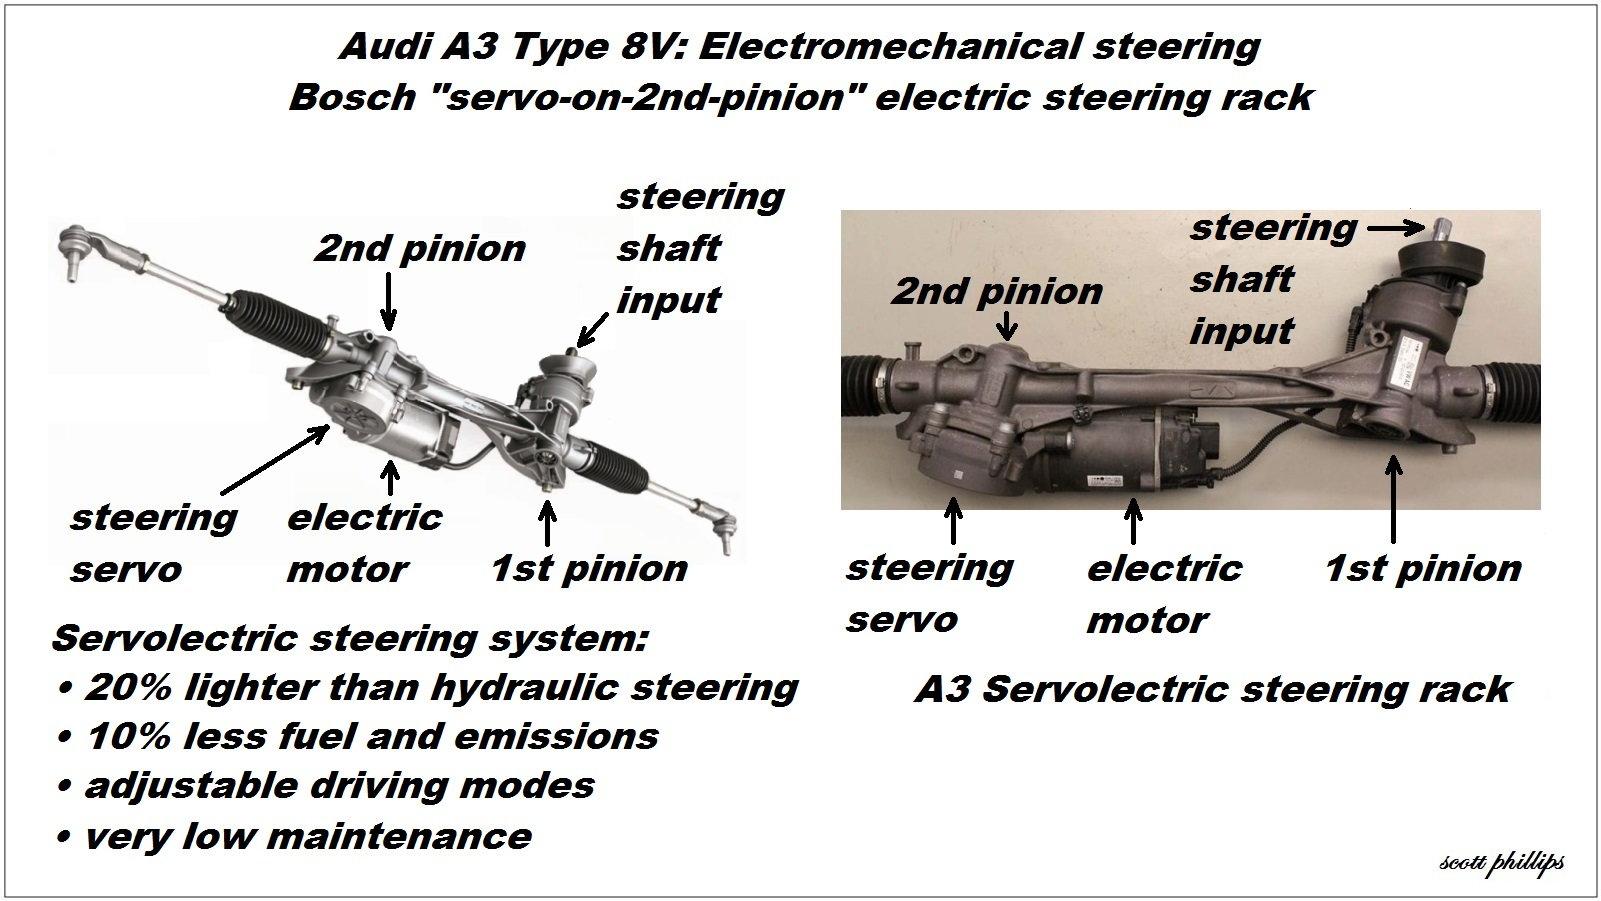 Audi A3 Tips and Tricks | Audiworld